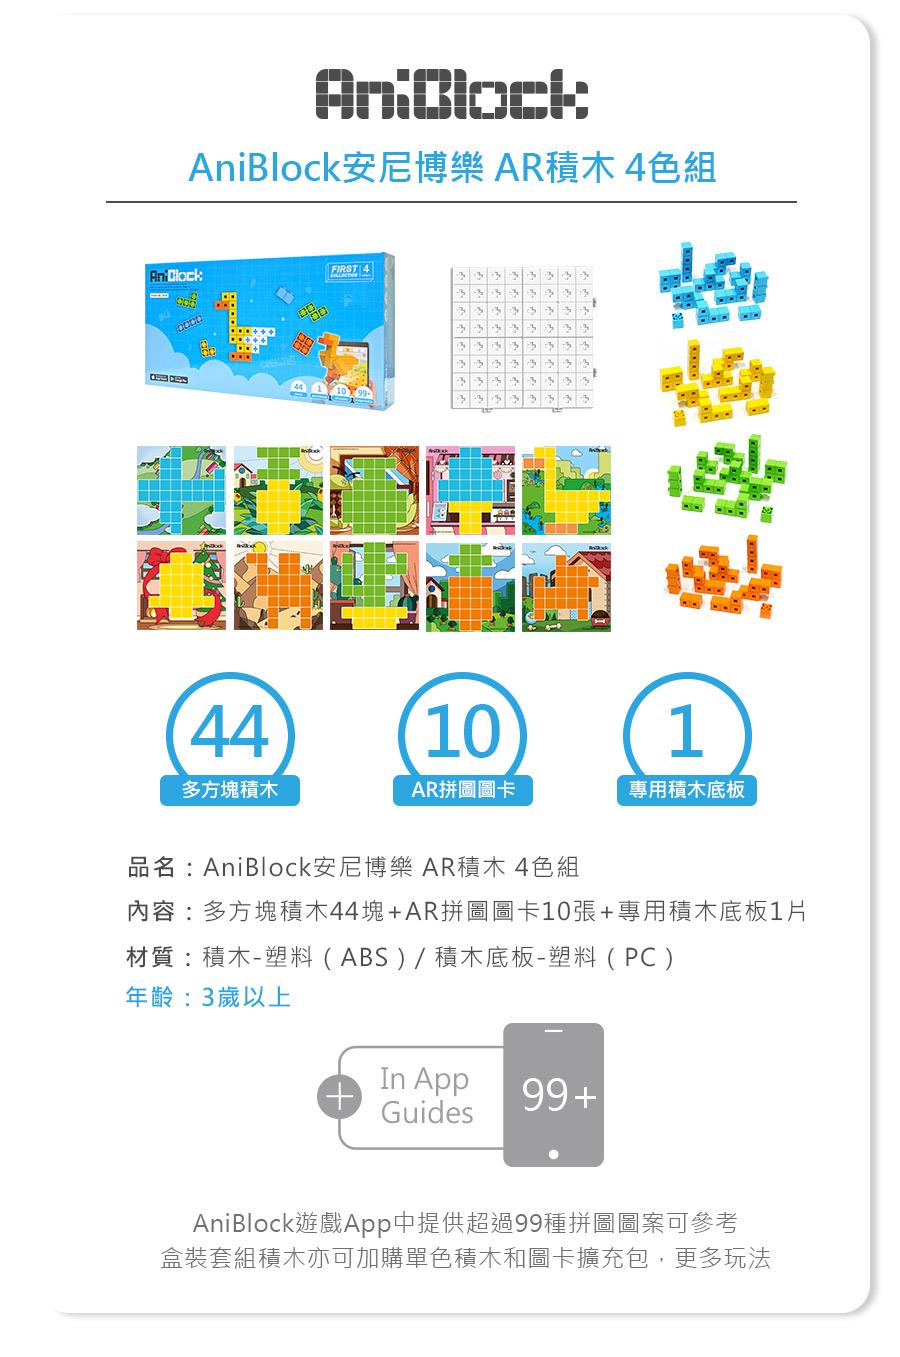 AniBlock AR積木拼圖 4色組 產品規格介紹